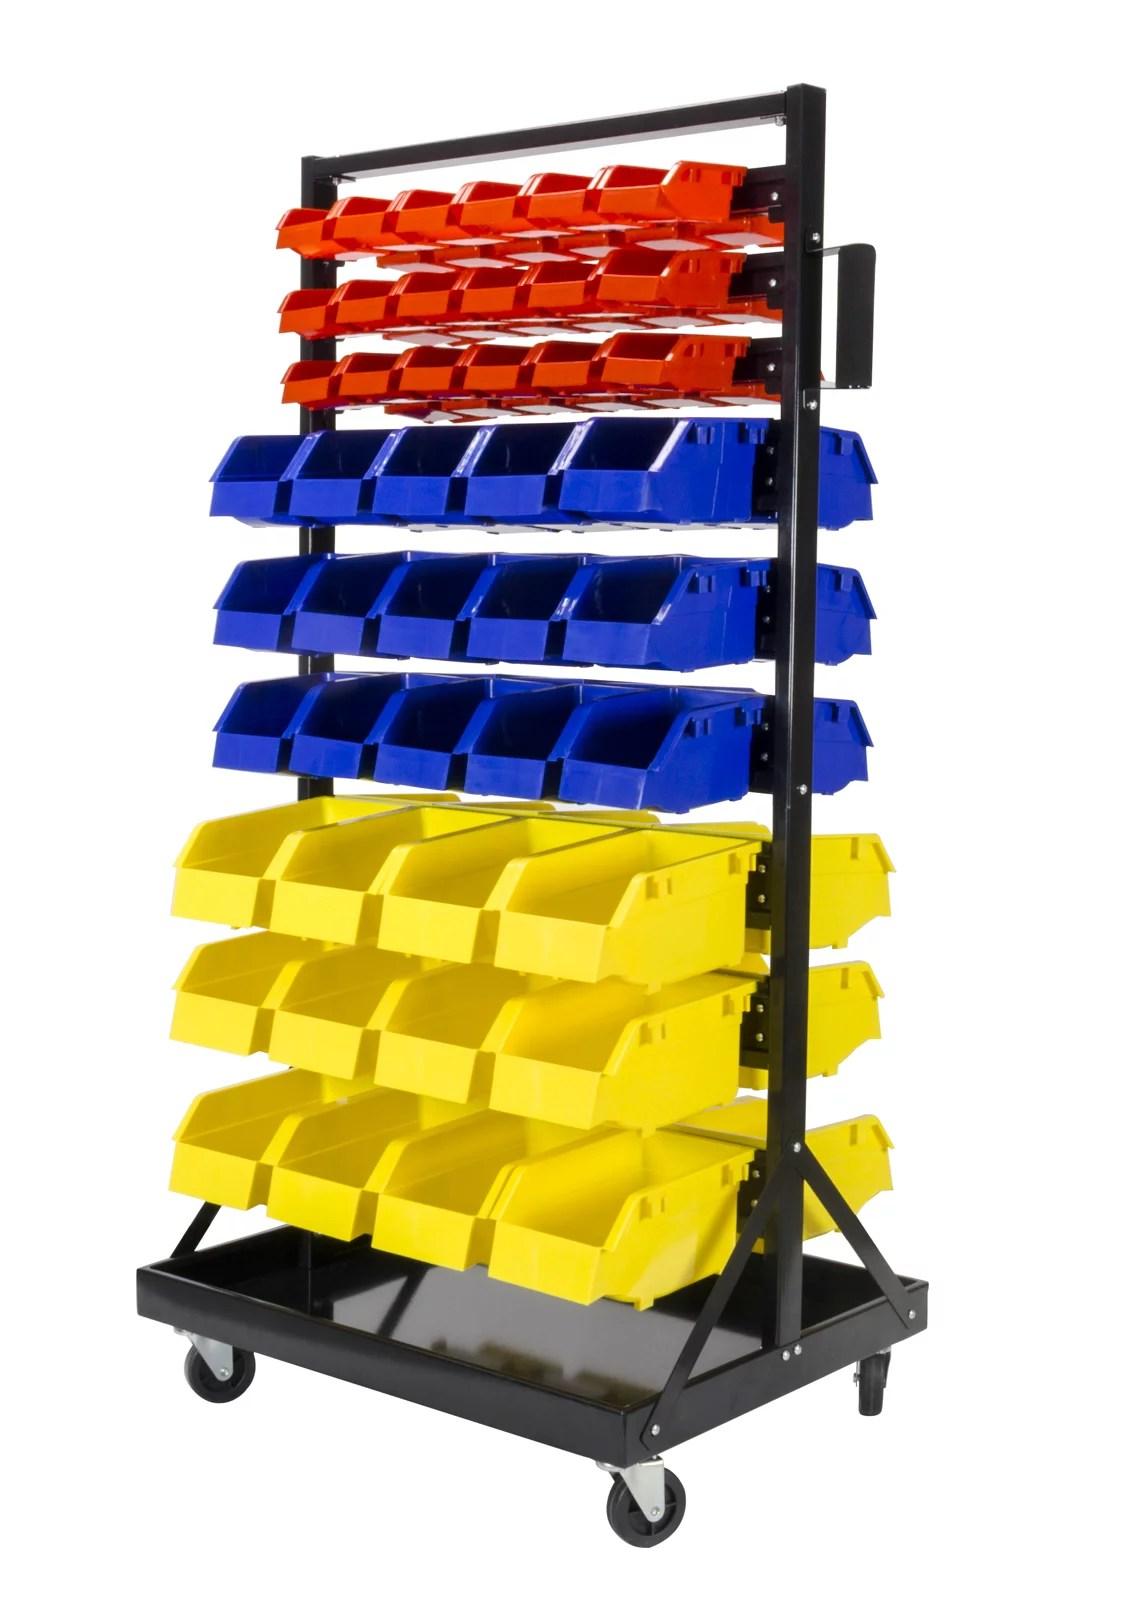 erie tools tlpb05 90 parts bin shelving storage organizer with locking wheels for shop garage and home walmart com